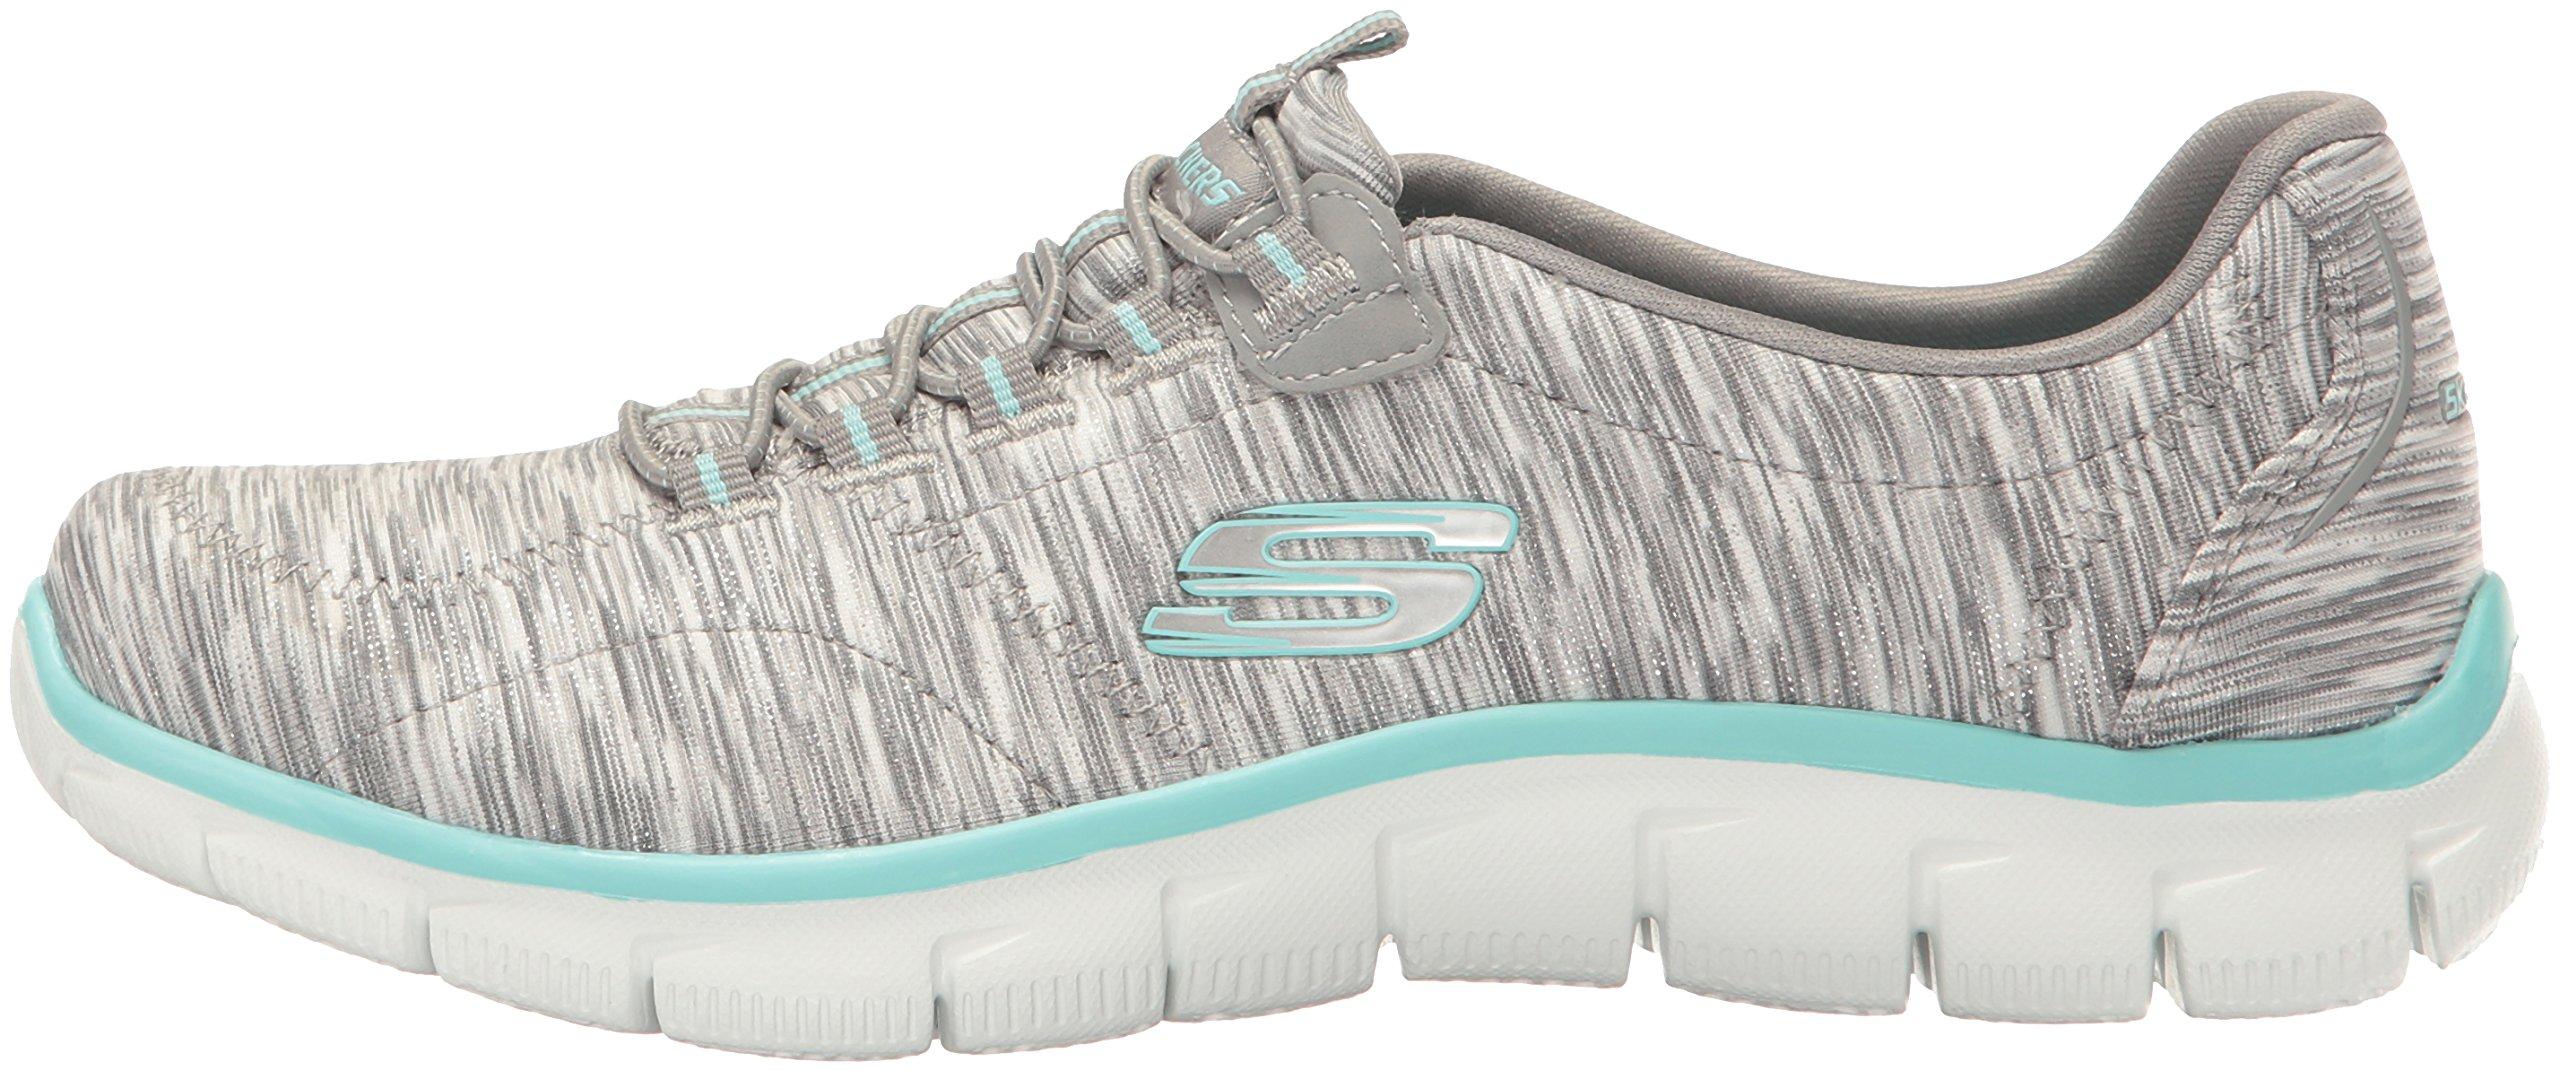 Skechers Women's Sport Empire - Rock Around Relaxed Fit Fashion Sneaker, Gray/Light Blue, 9 B(M) US by Skechers (Image #5)